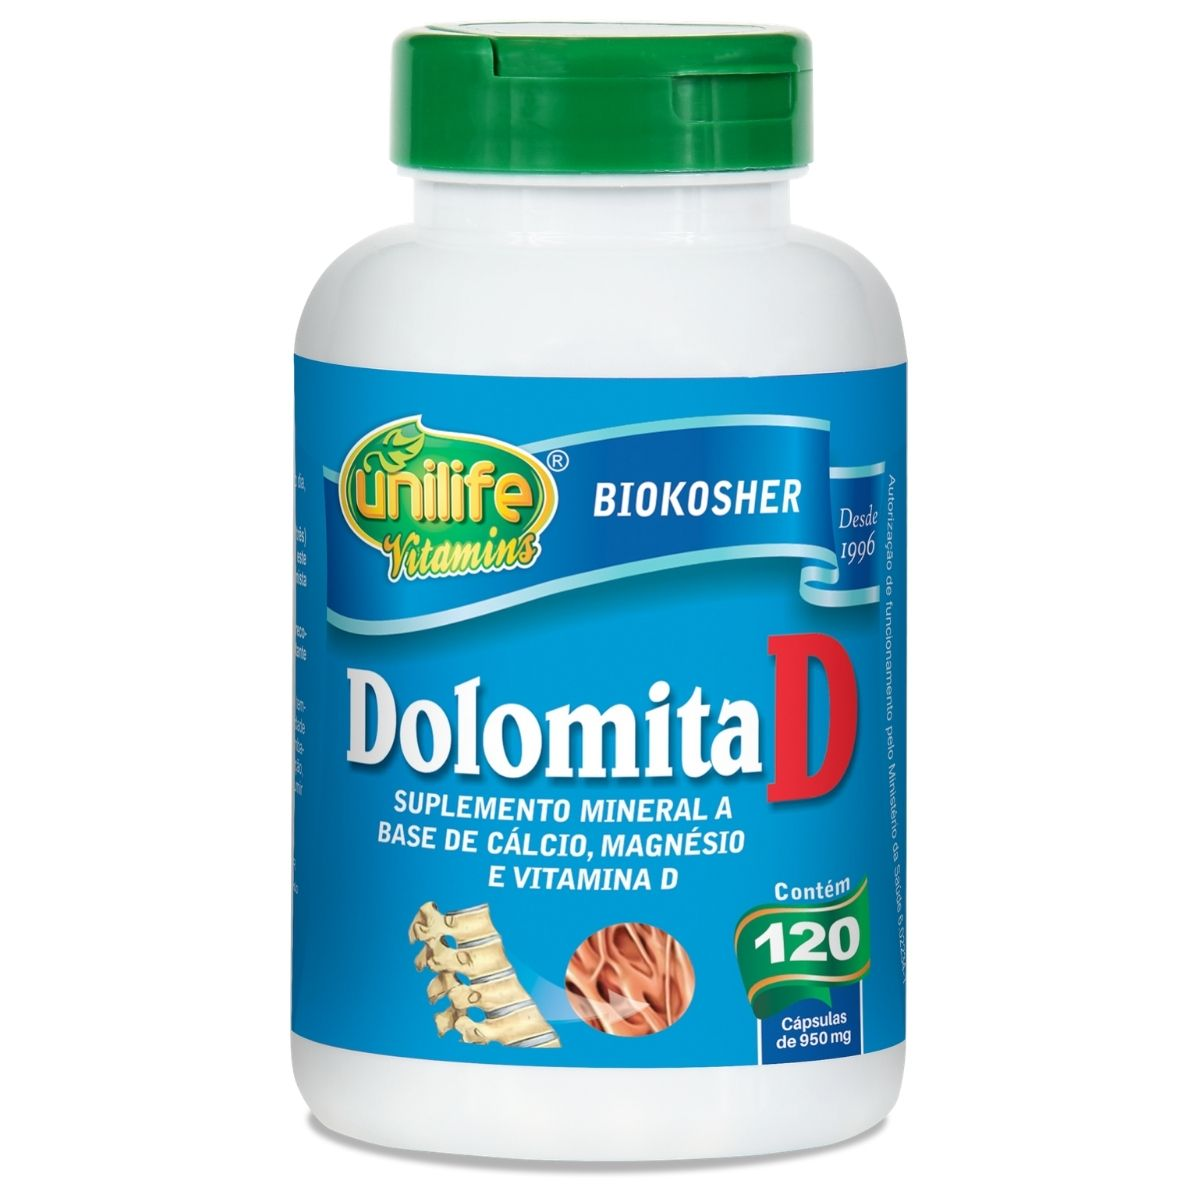 Dolomita D - Cálcio, Magnésio e Vitamina D3 120 Cápsulas - Unilife